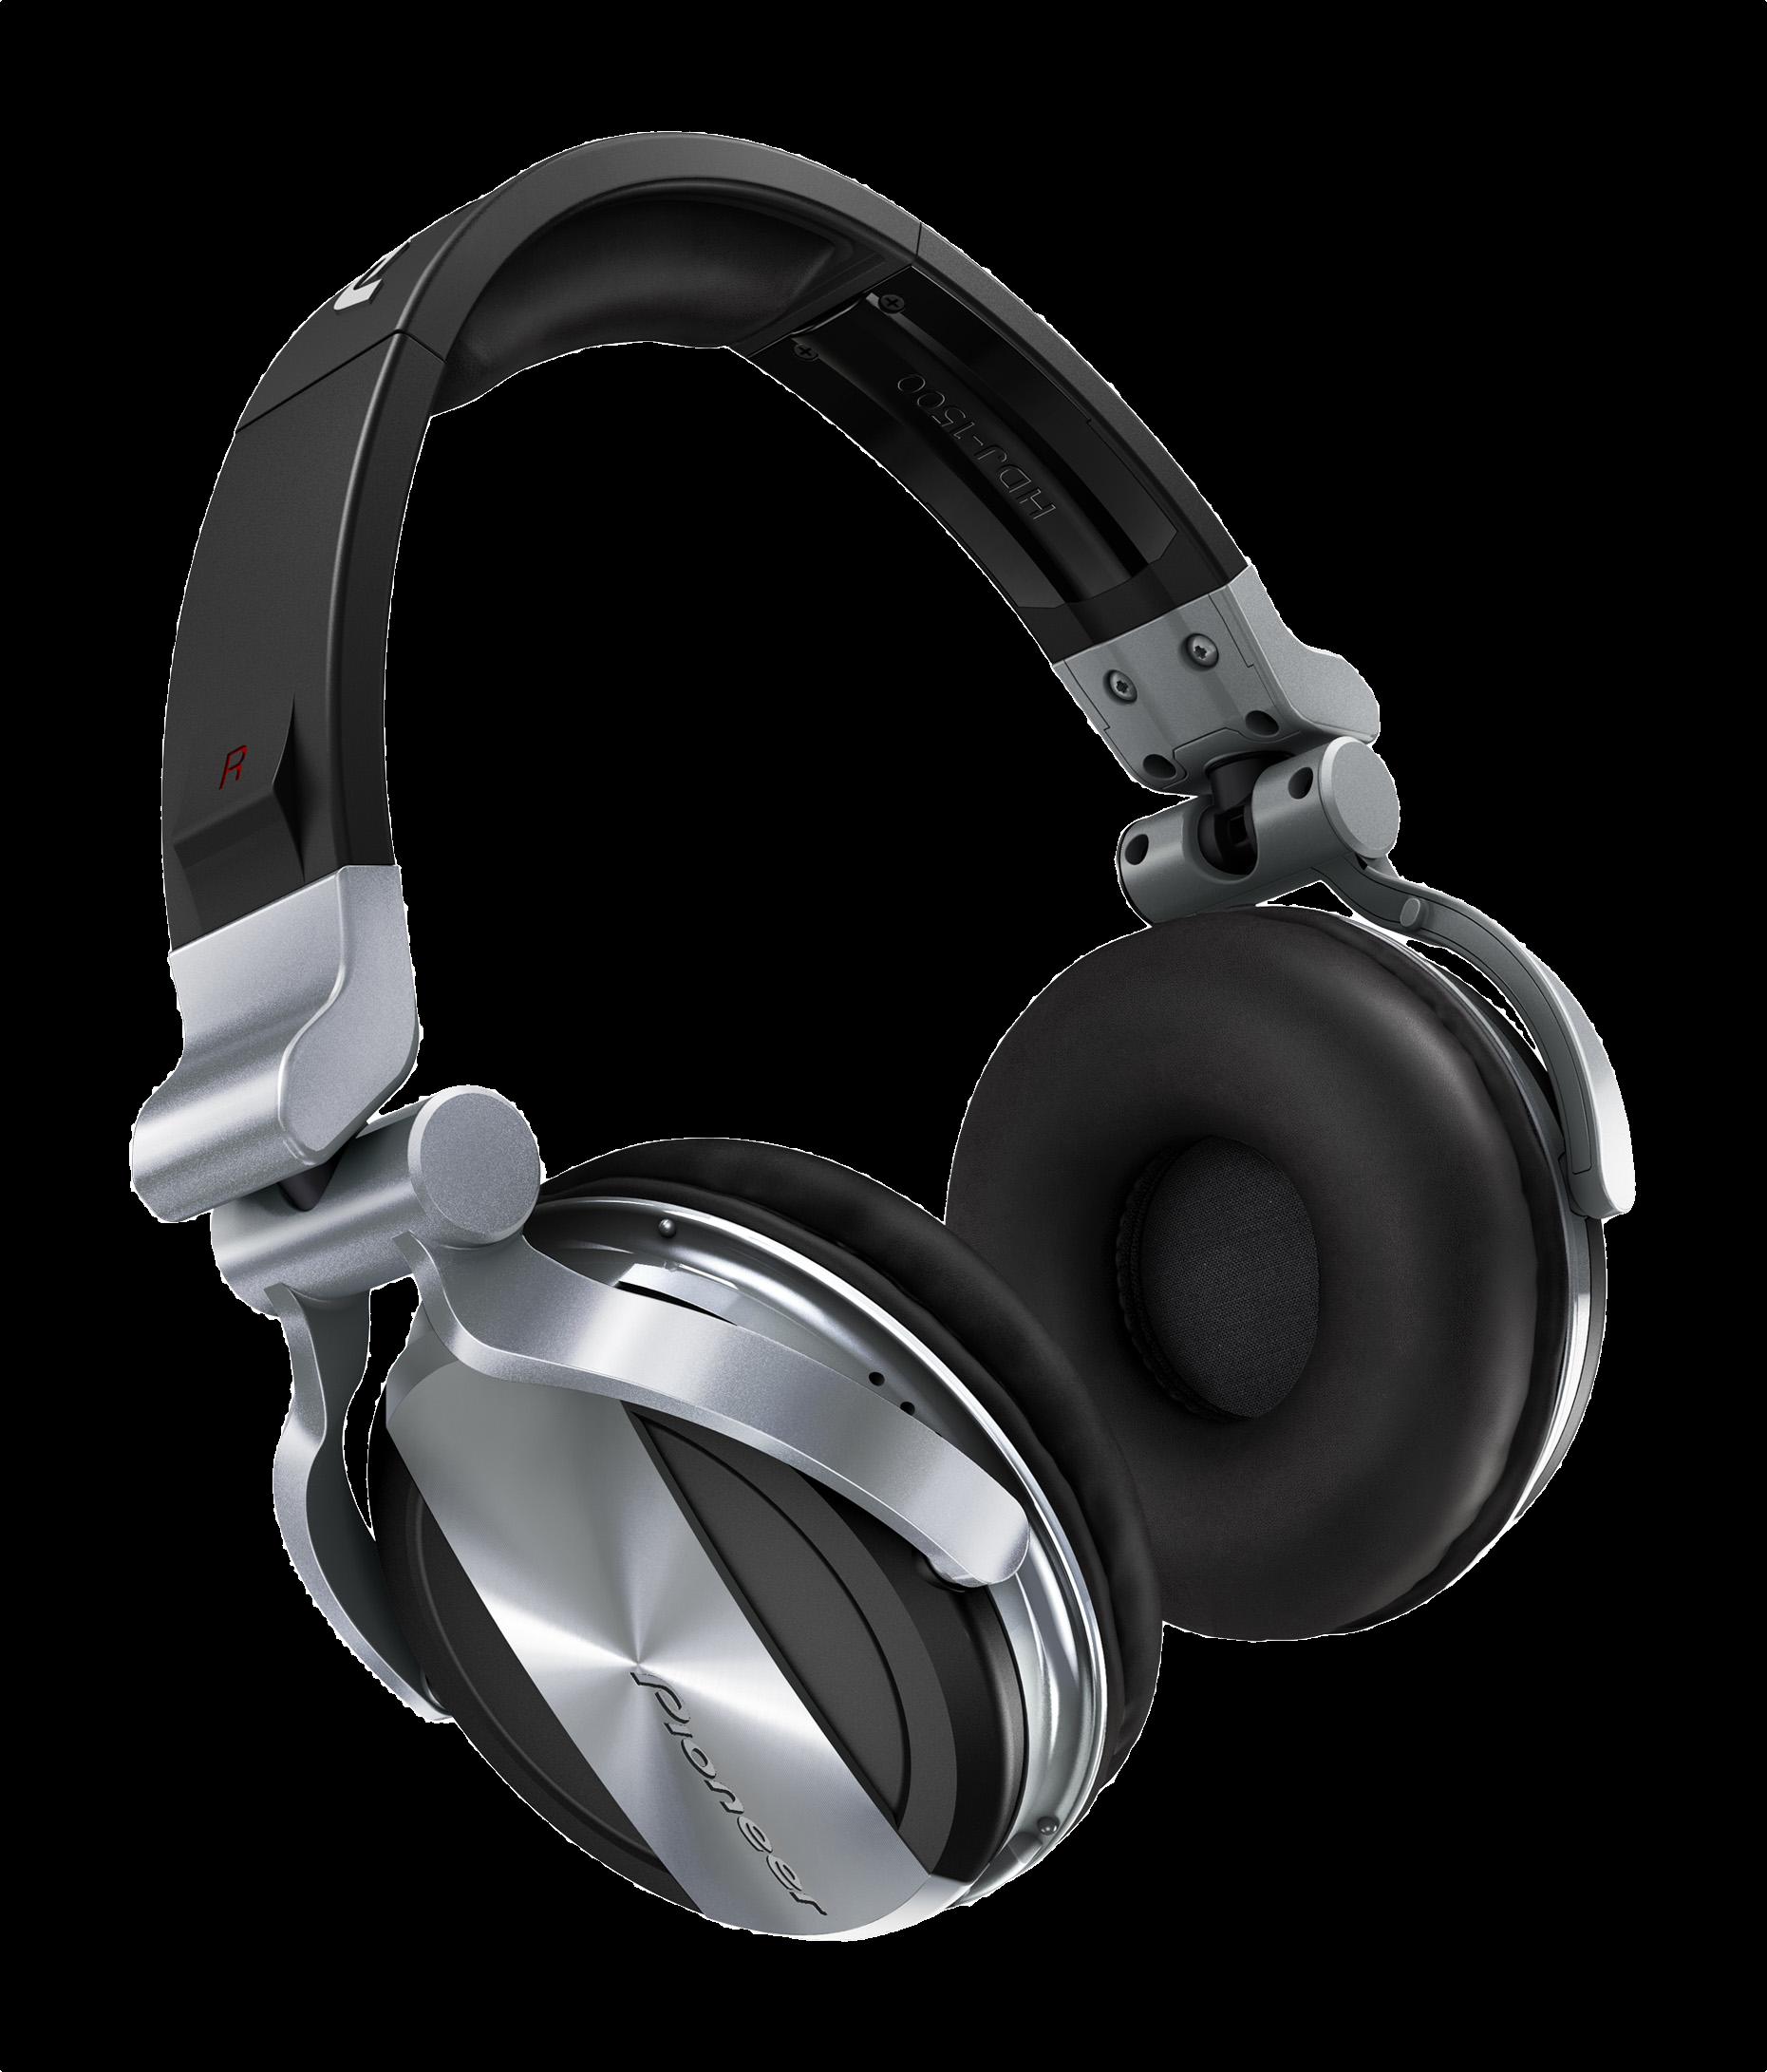 Headphones Png Image #20157 - Headphones, Transparent background PNG HD thumbnail